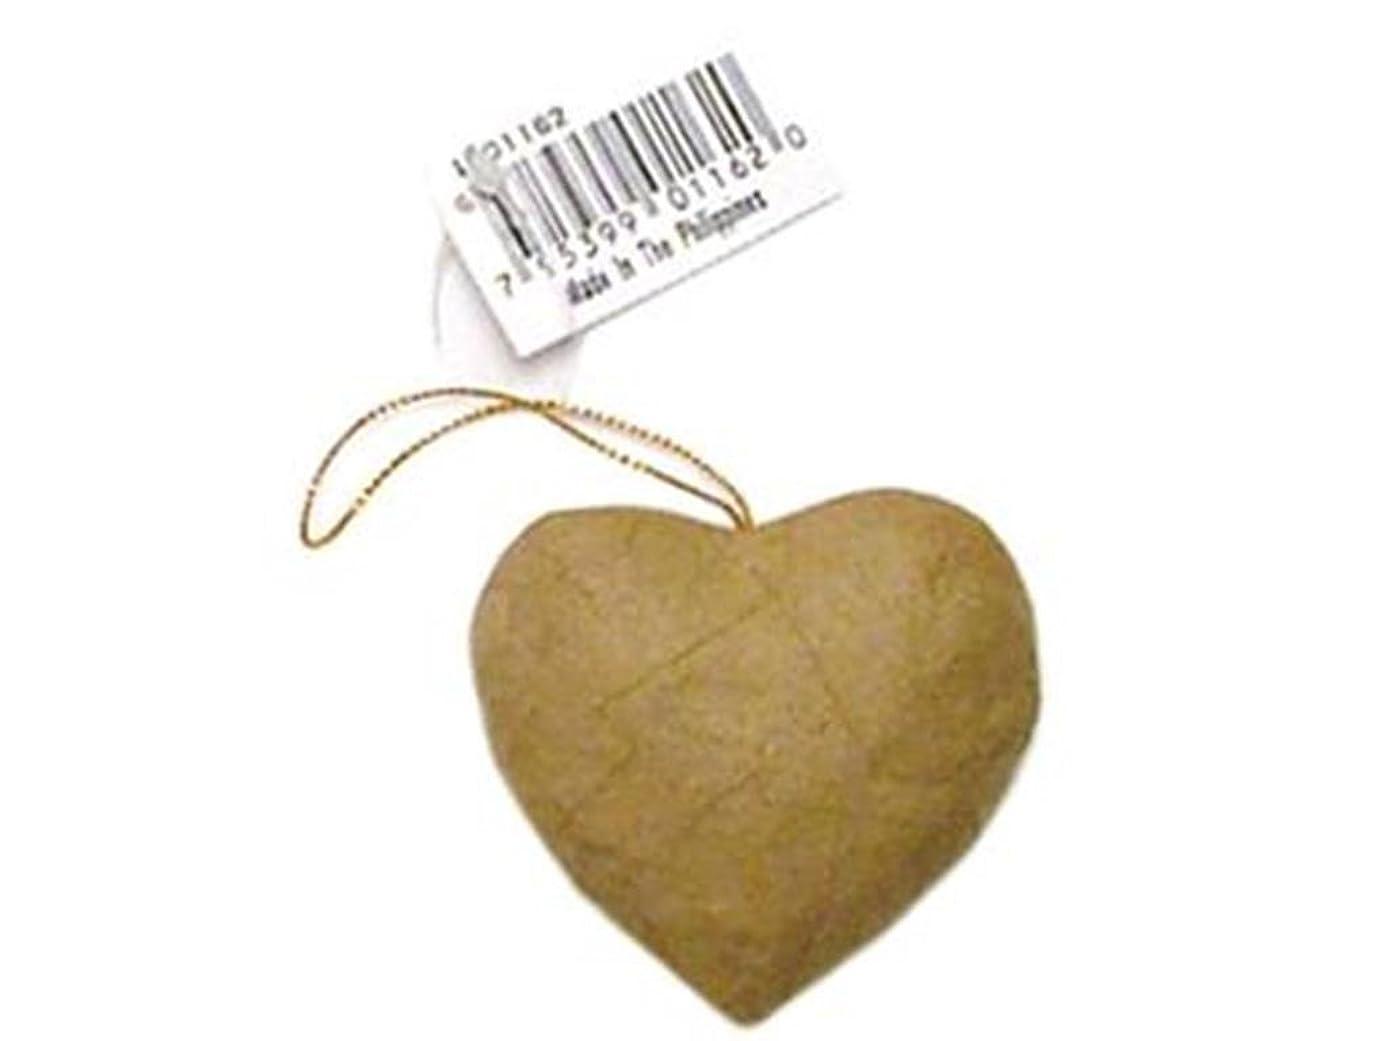 Craft Pedlars Craft Ped Paper Mache Ornament Puffy Heart Kraft